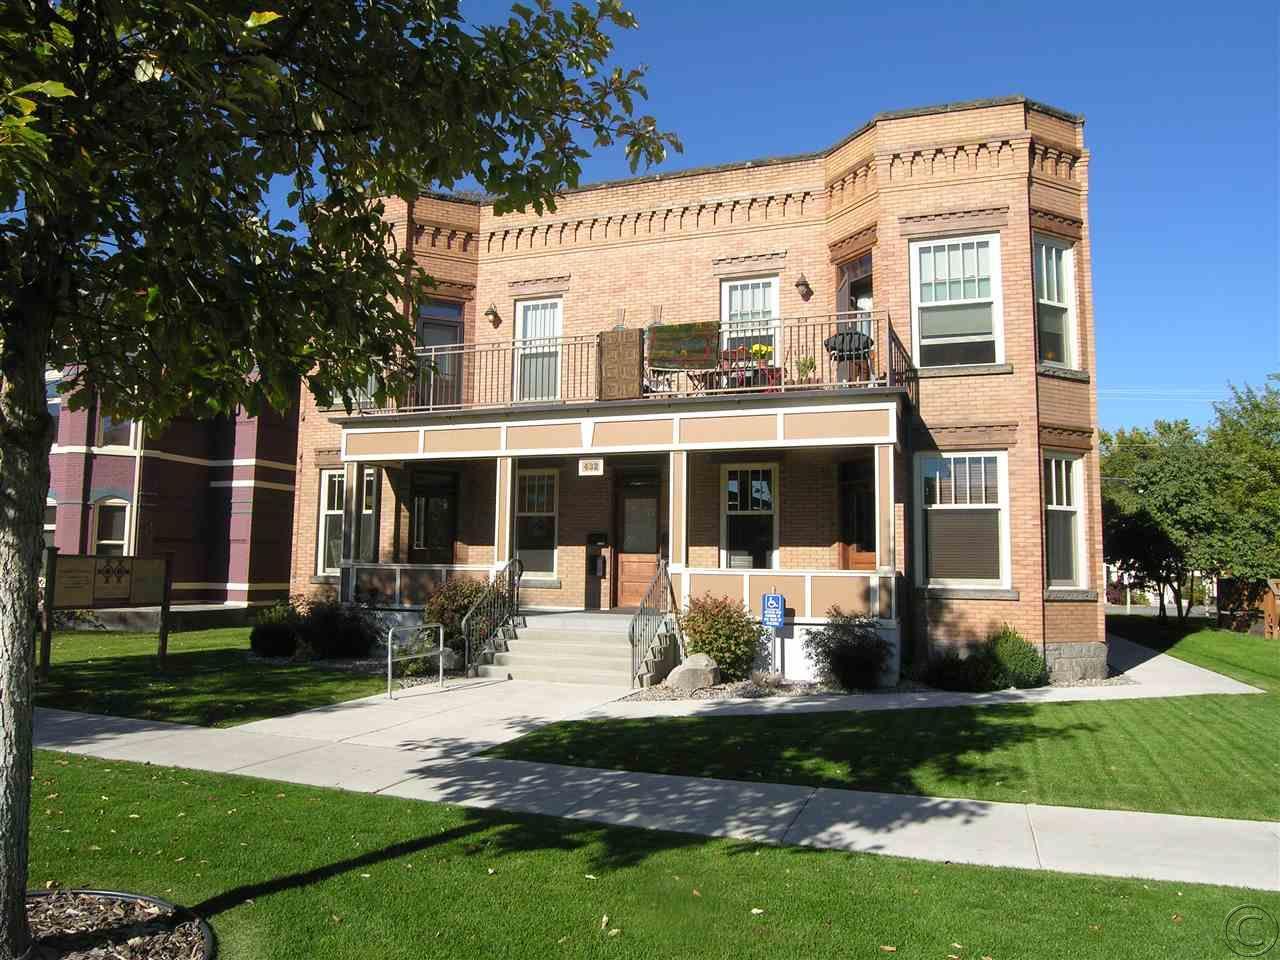 432 W Spruce St, Missoula, MT 59802